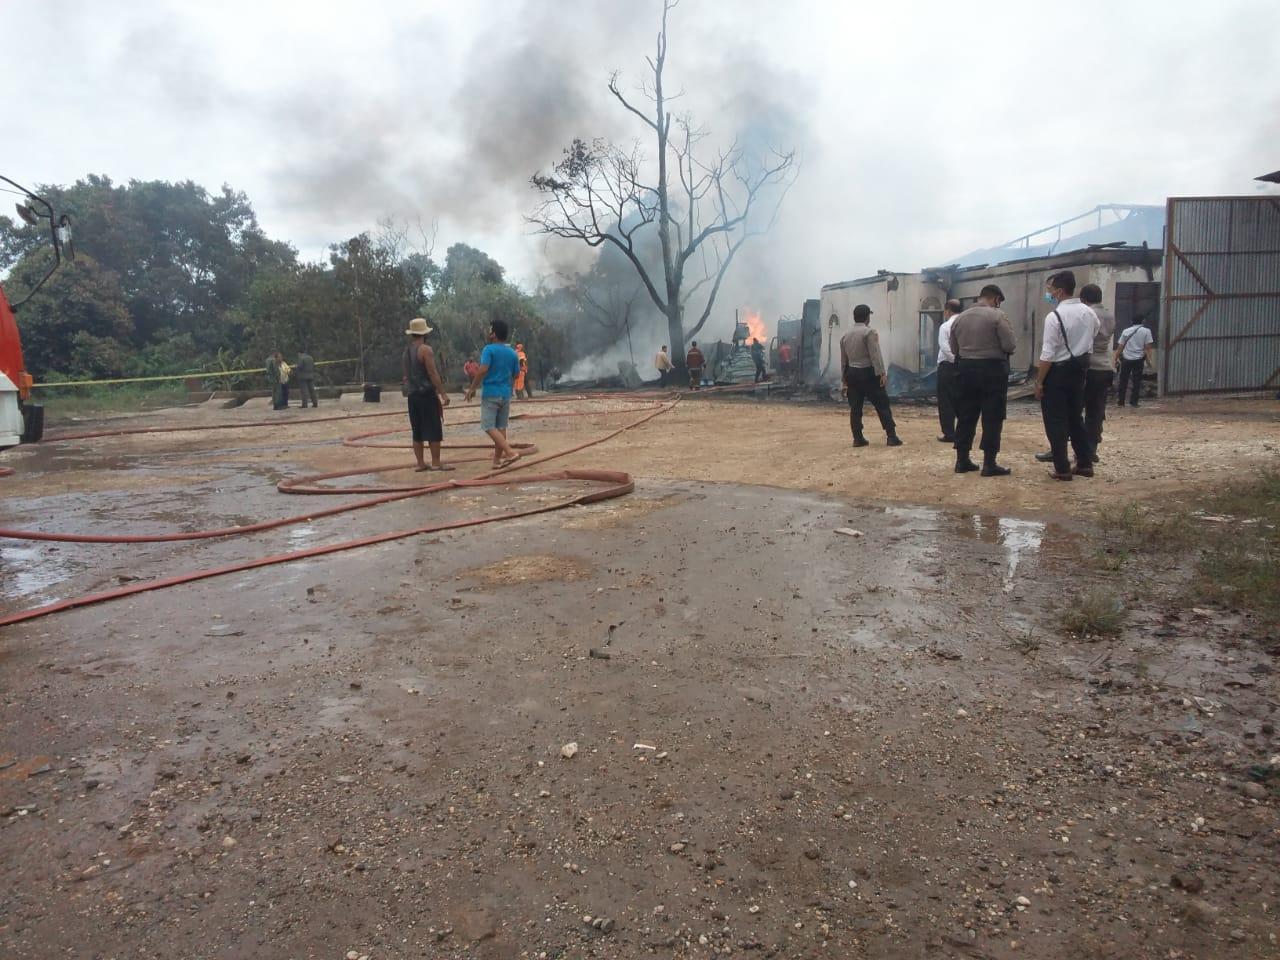 Kebakaran Hebat, Diduga Gudang Penyimpanan Minyak Ilegal Ludes Terbakar